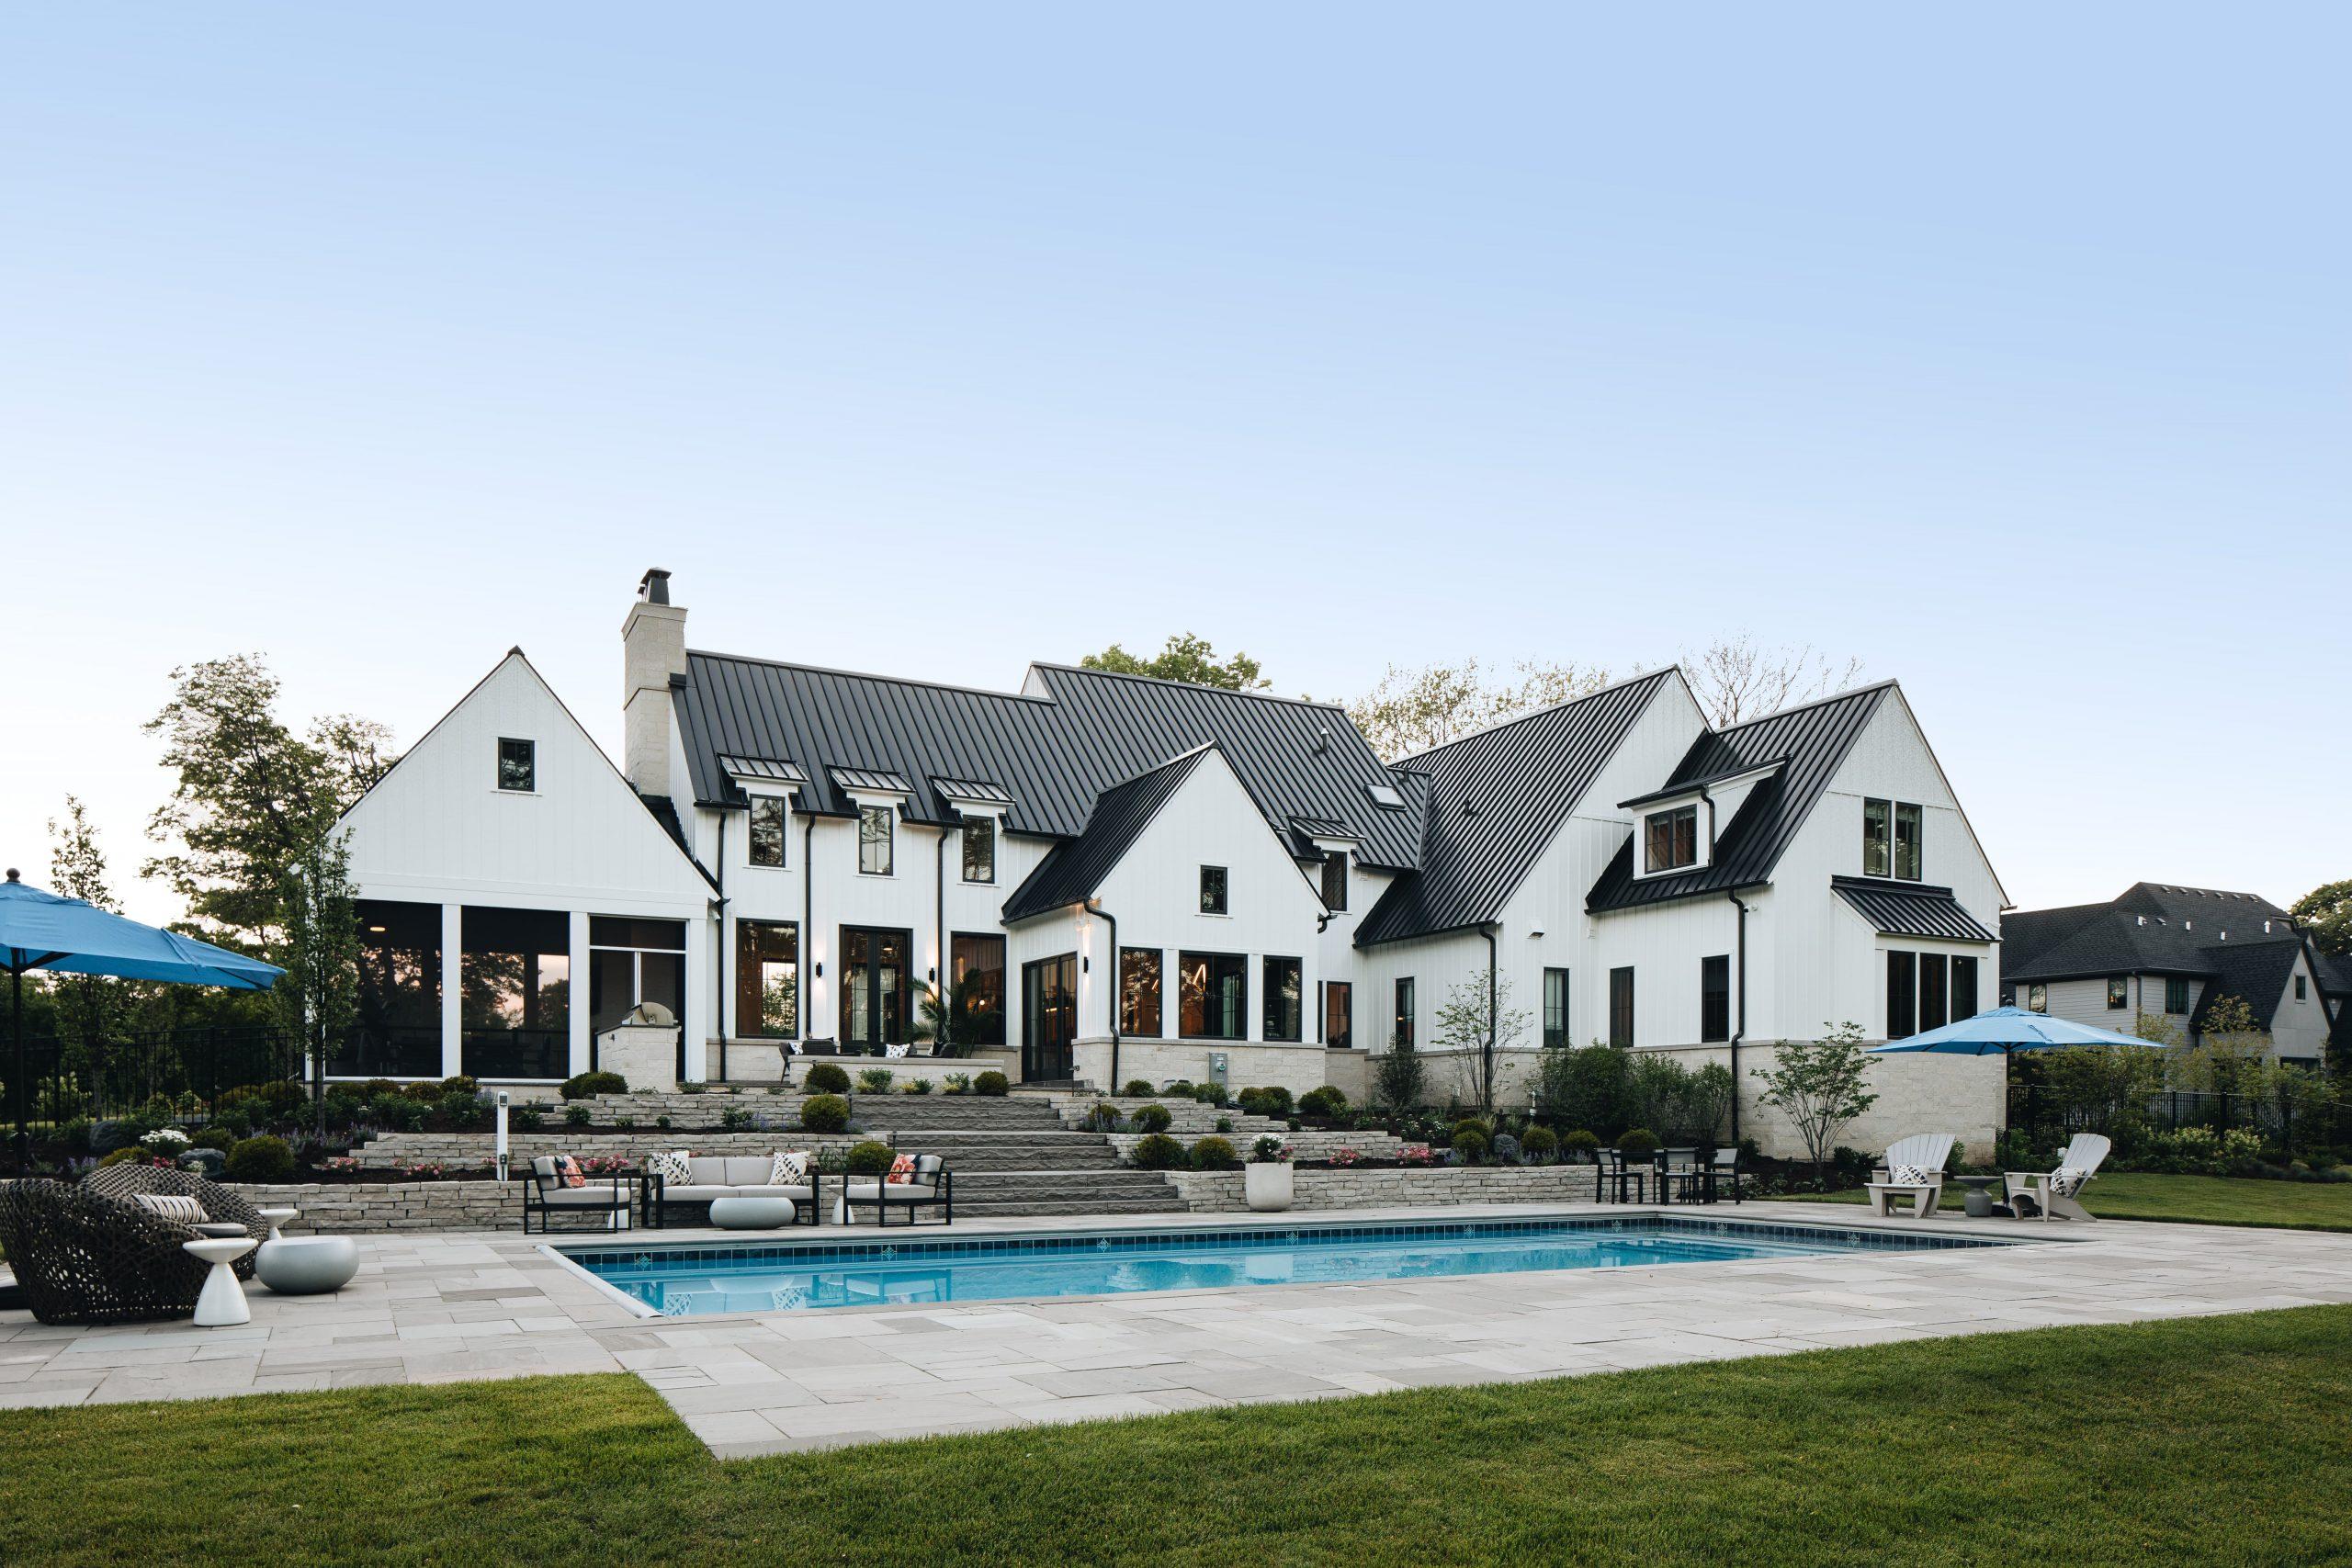 The backyard and pool of Aspen vs Wheaton